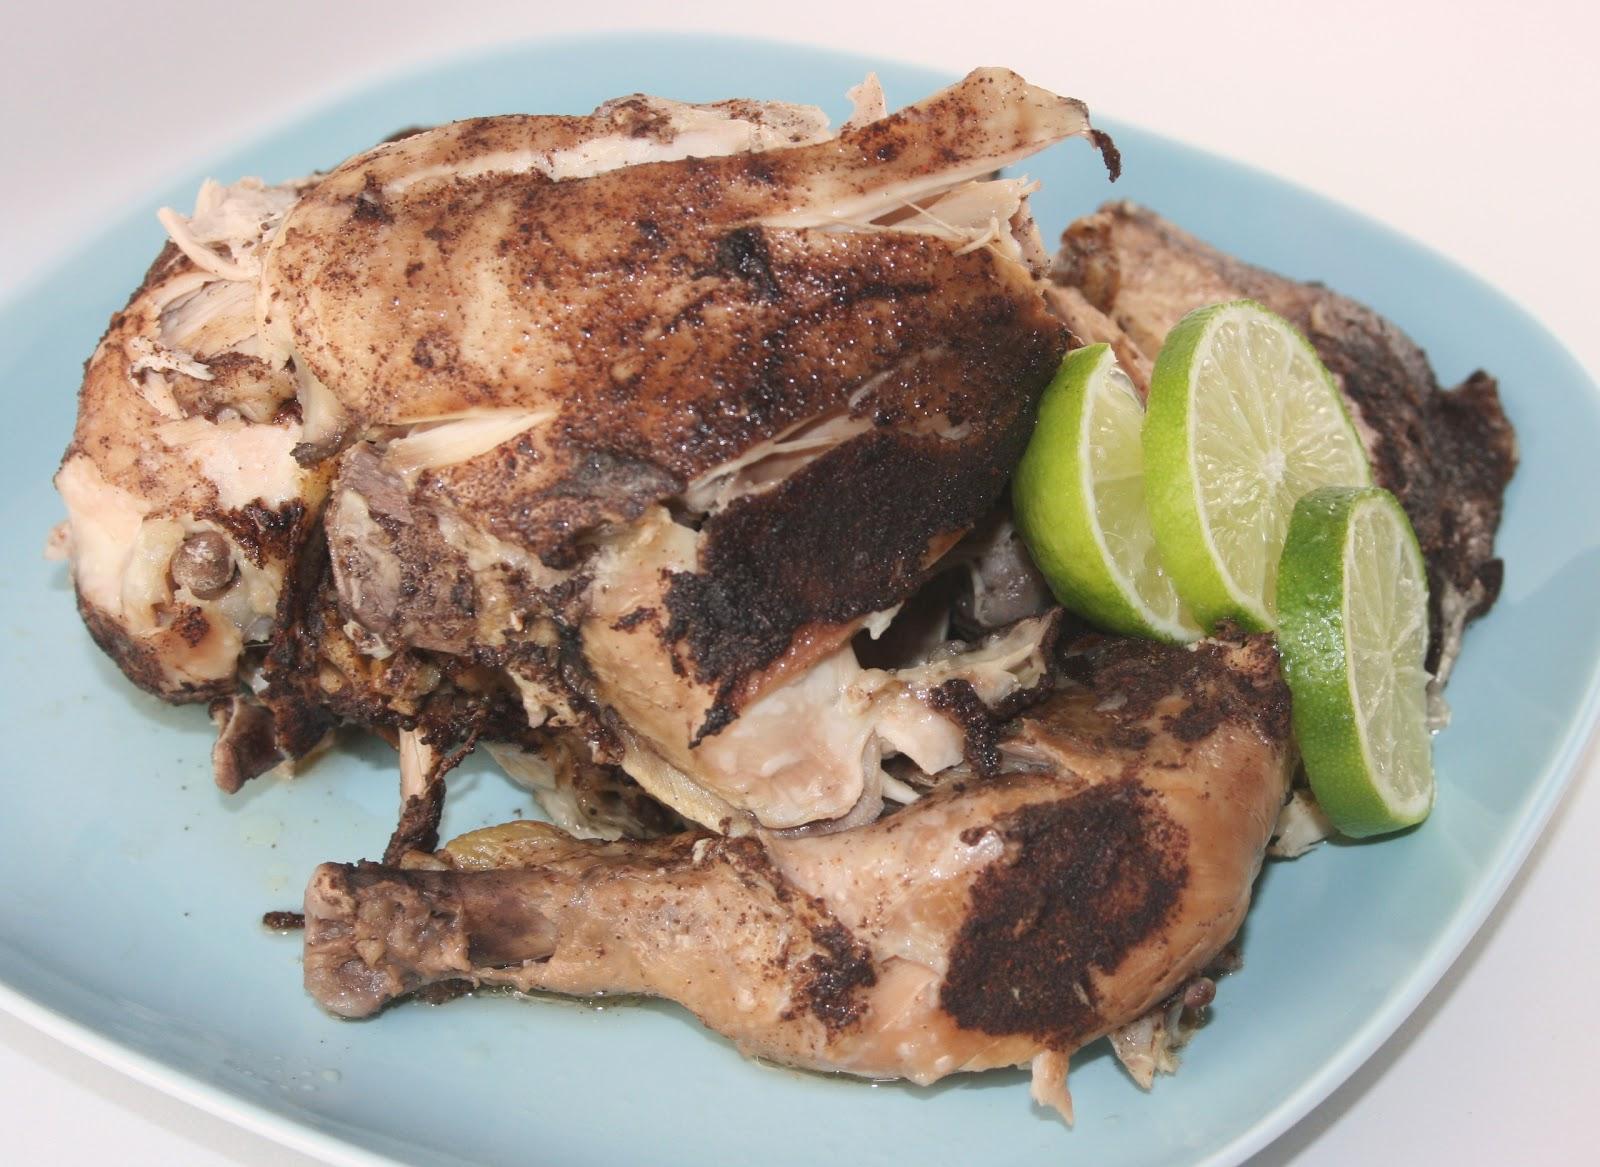 Slow cooker caribbean jerk chicken recipe recipe recipes slow cooker caribbean jerk chicken recipe forumfinder Image collections